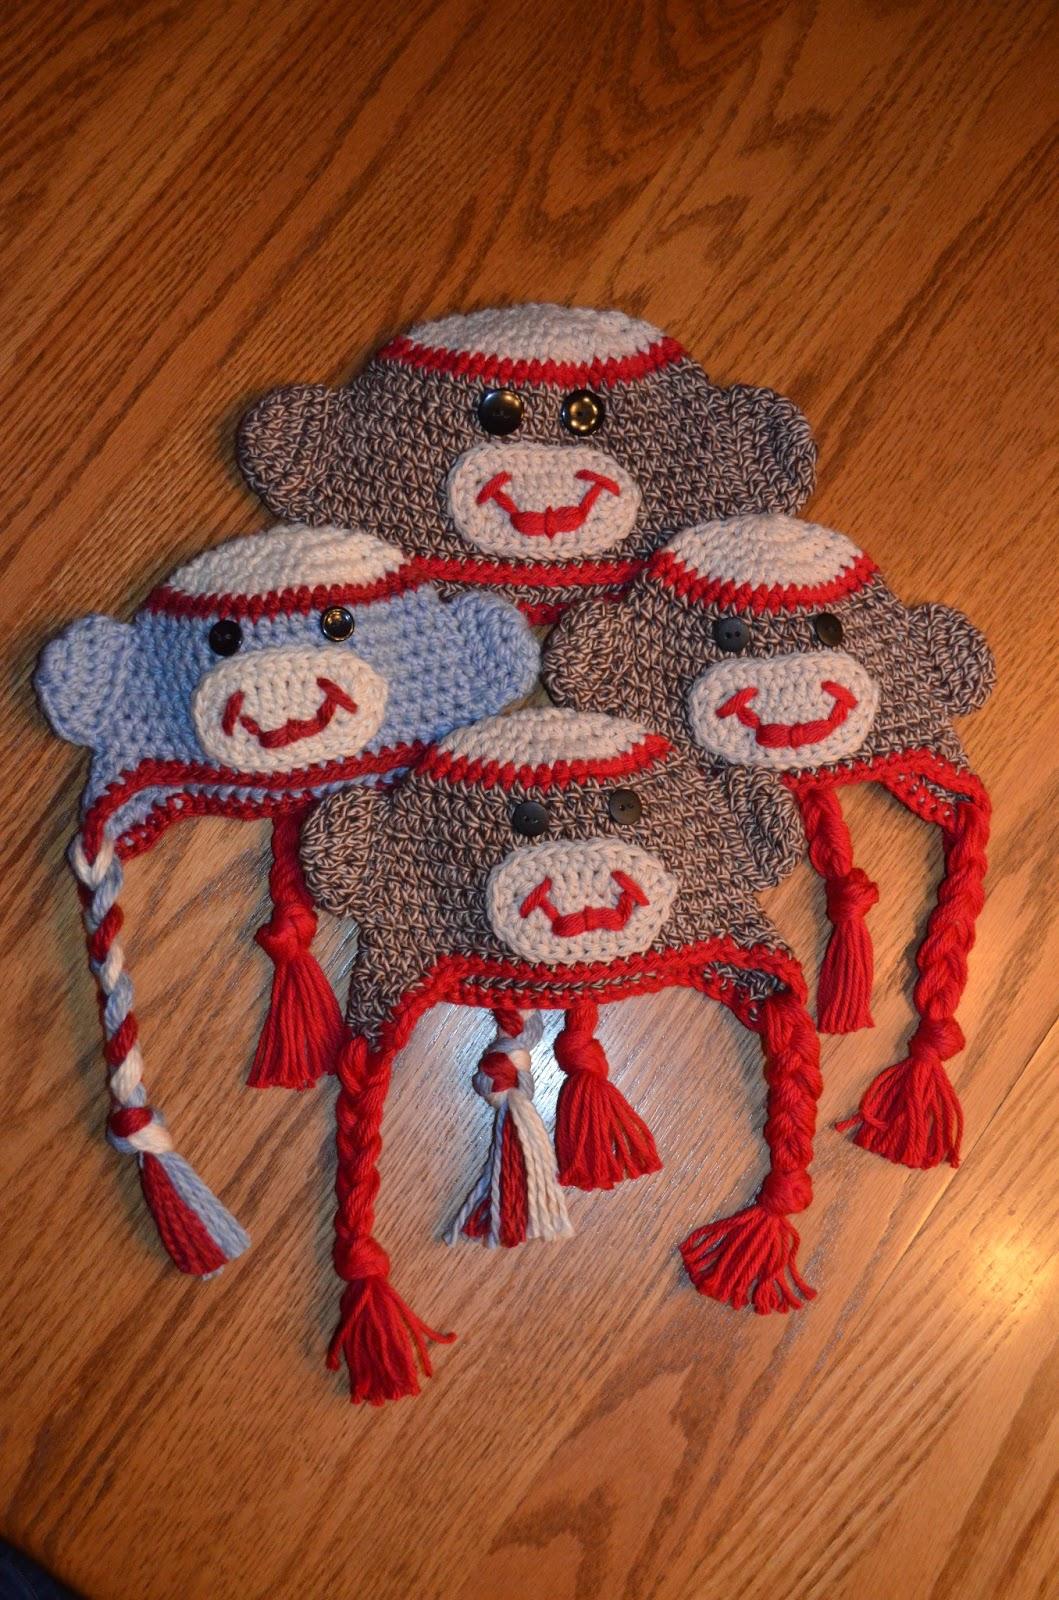 Free crochet patterns free crochet patterns baby hats and beanies free crochet sock monkey pattern bankloansurffo Images